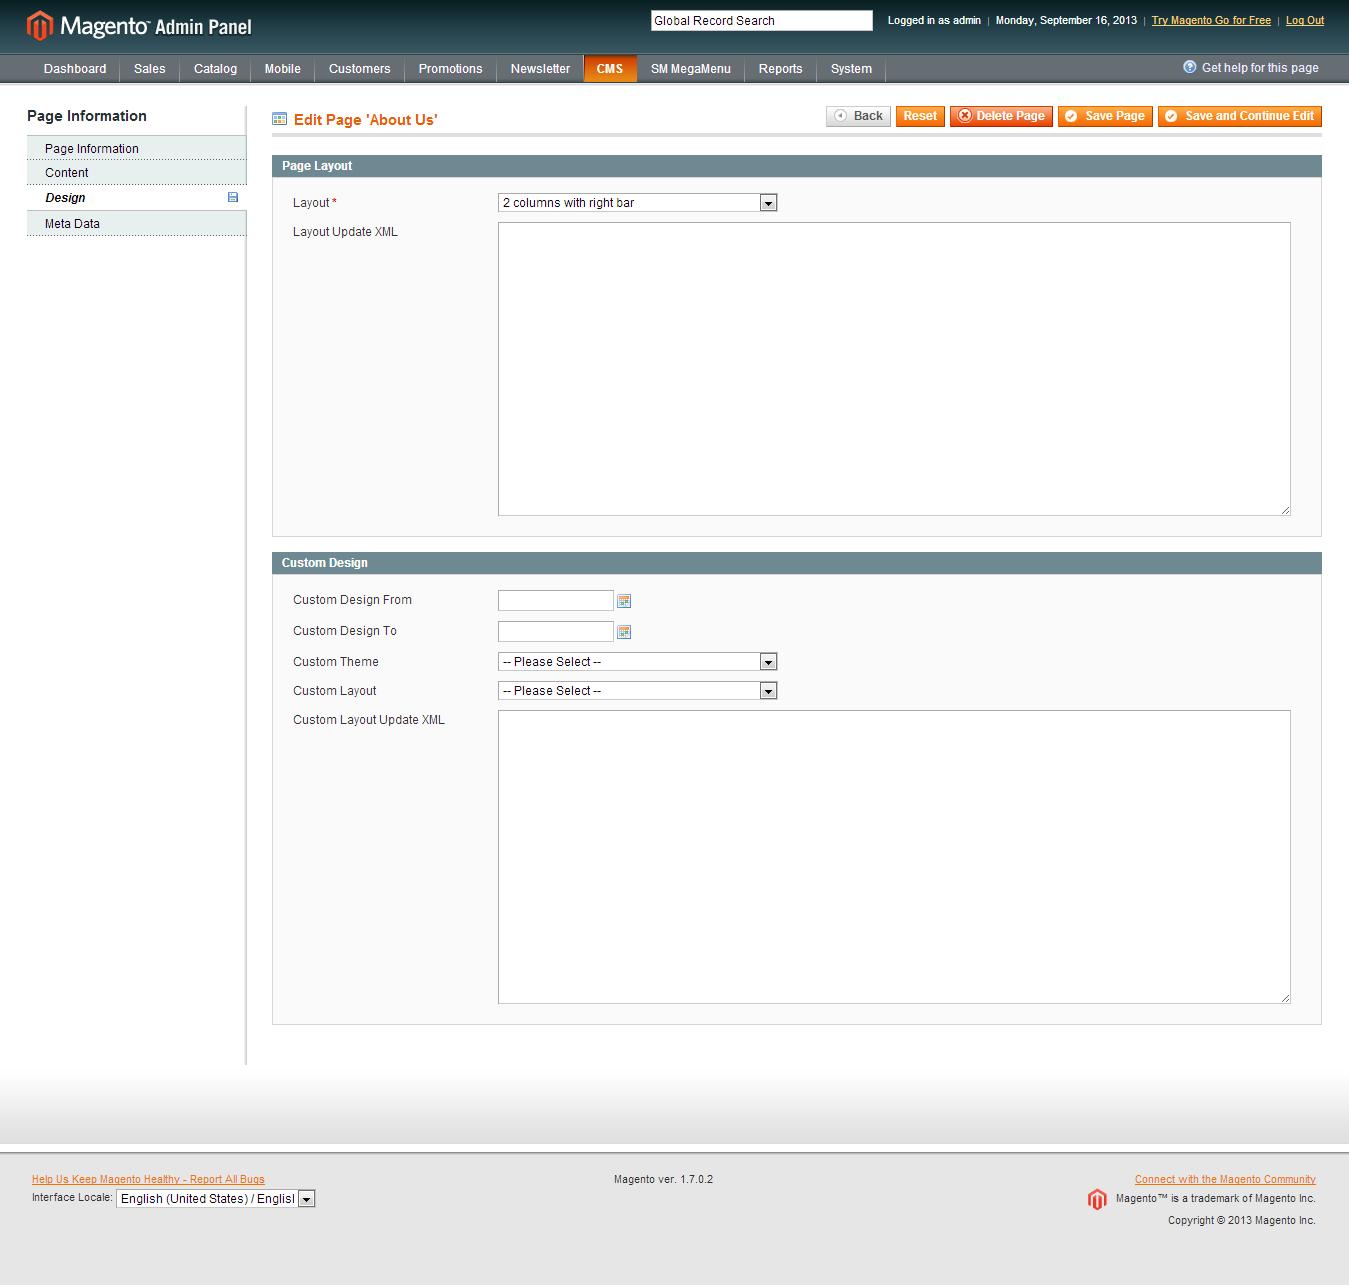 Customer account login/index.php/admin/Cms_Wysiwyg/directive - Mega Tab Backend